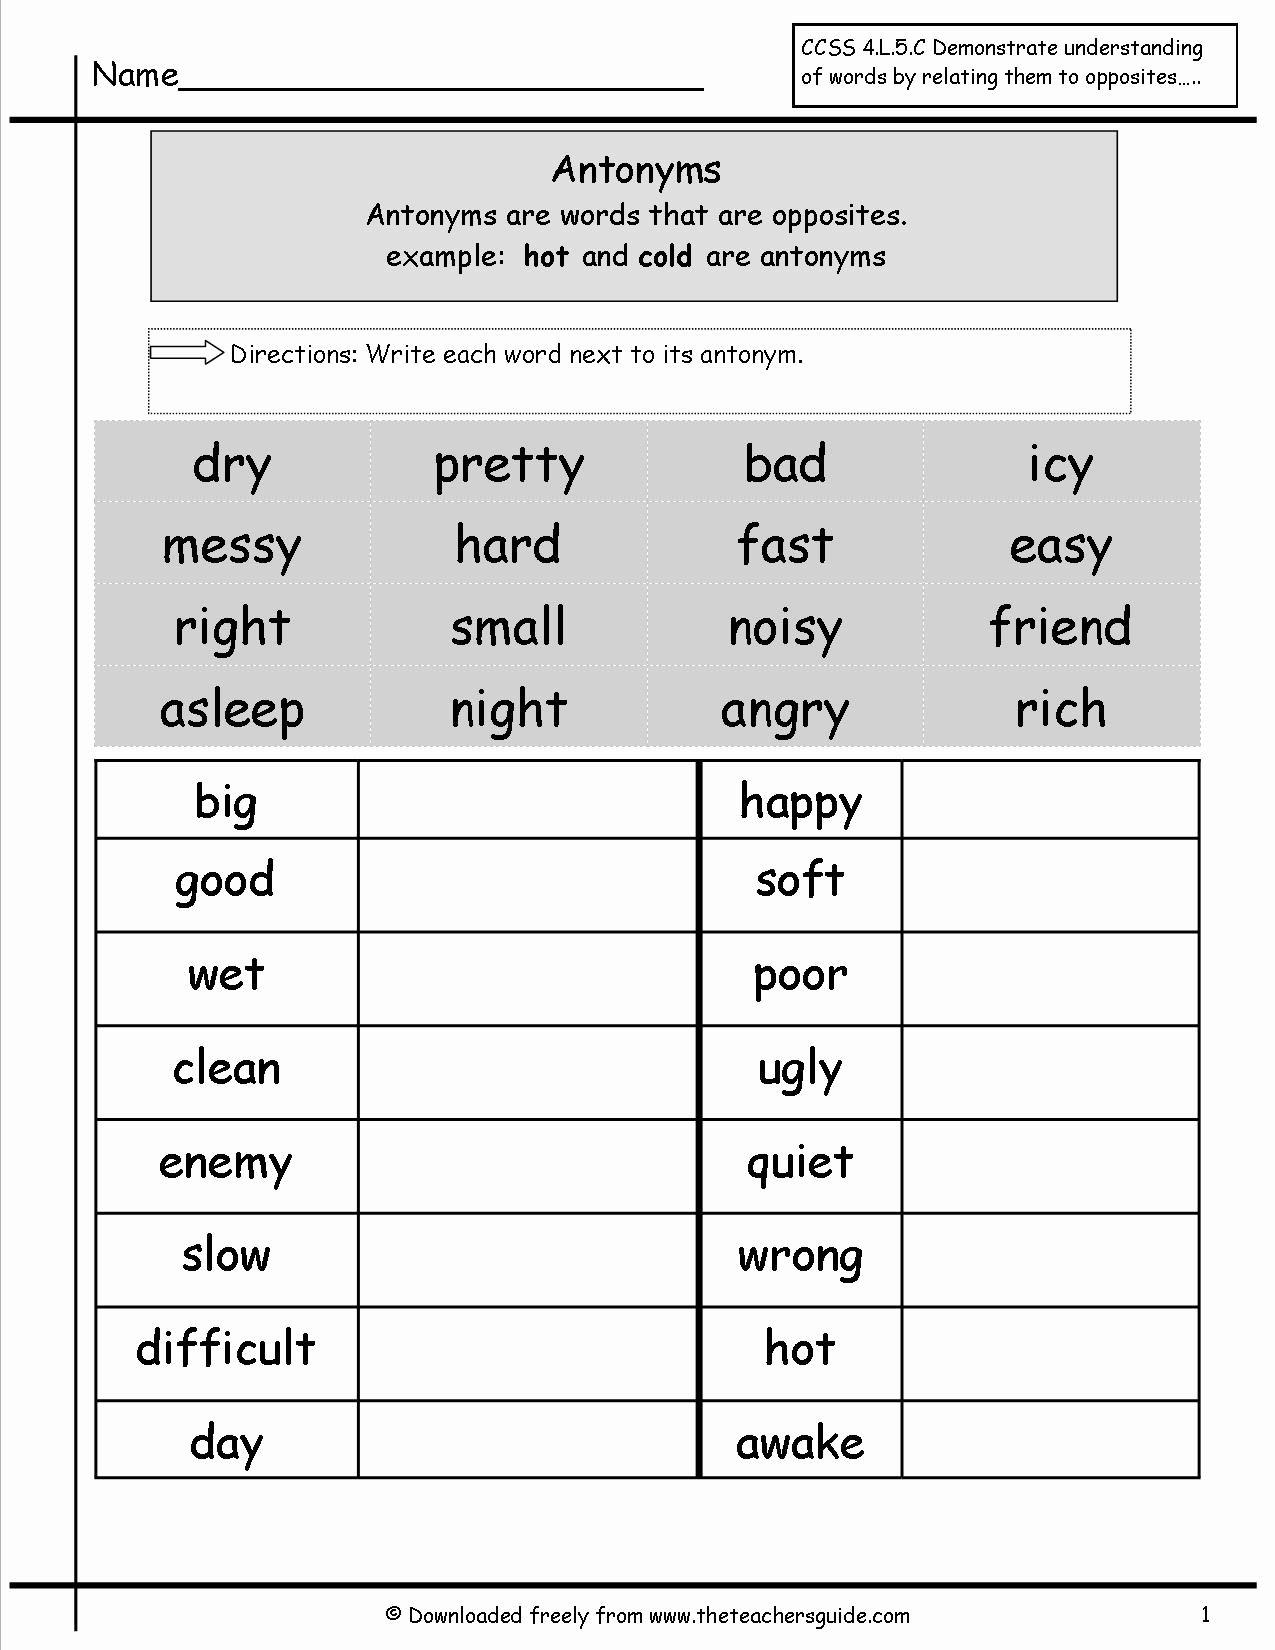 Antonyms Worksheets Grade 2 Best Of 18 Best Images Of 1st Grade Worksheets Synonyms Antony Third Grade Grammar Worksheets Grammar Worksheets Antonyms Worksheet